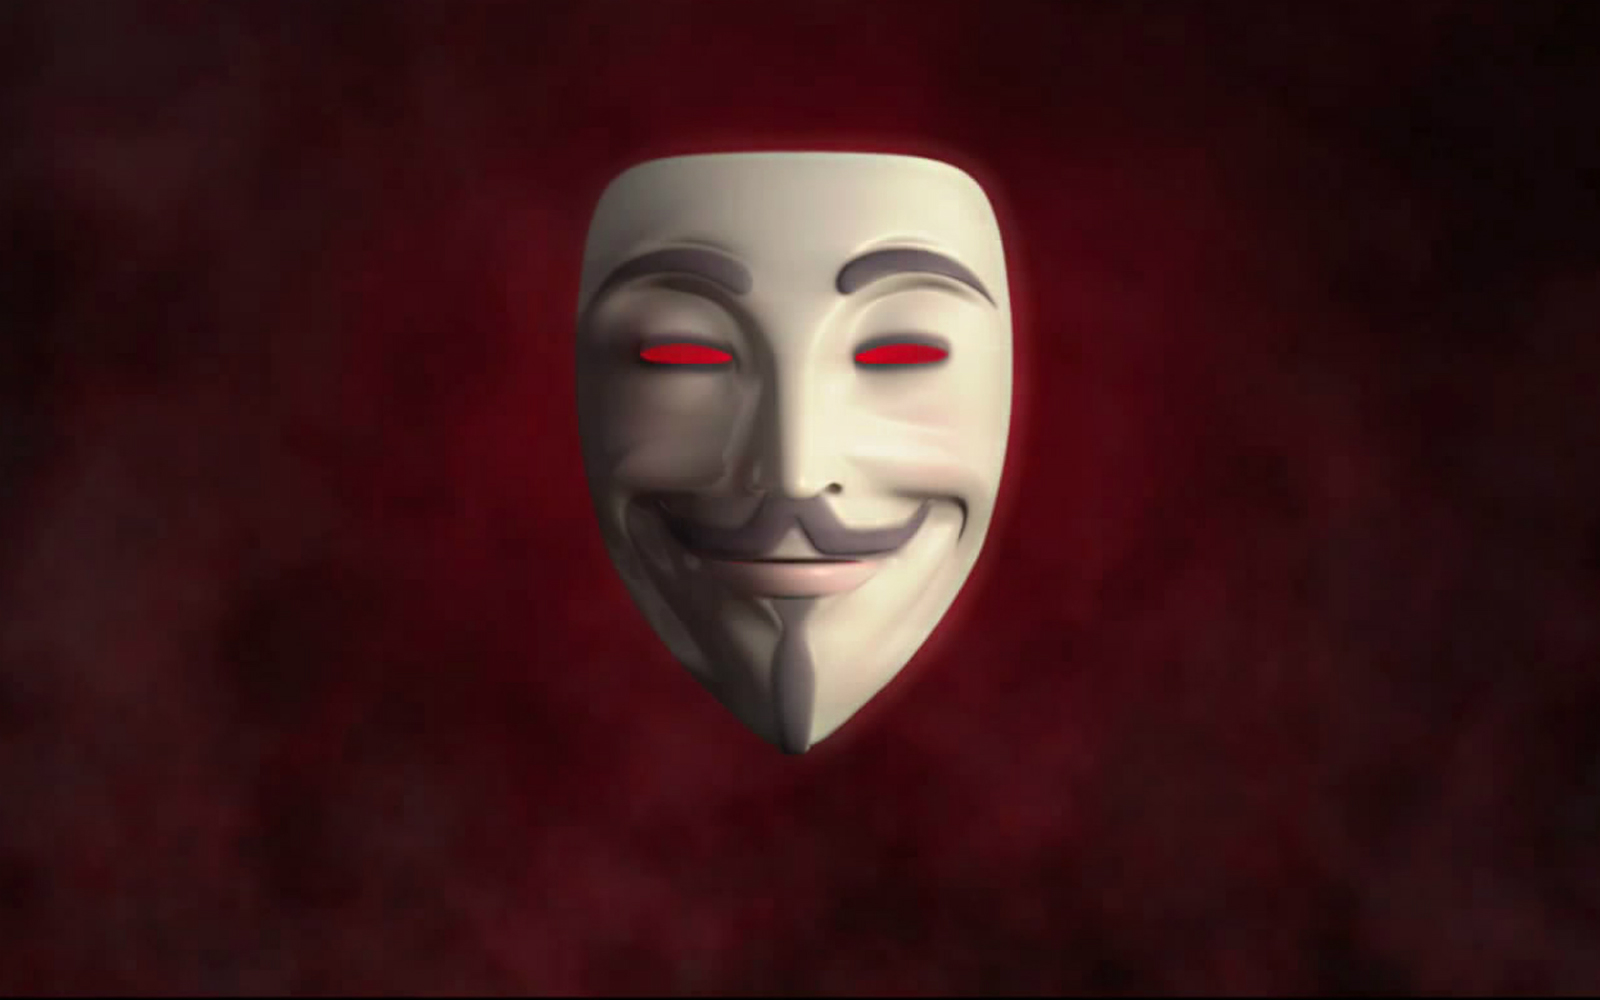 V For Vendetta Mask Wallpaper Quotes Guy Fawkes Mask...